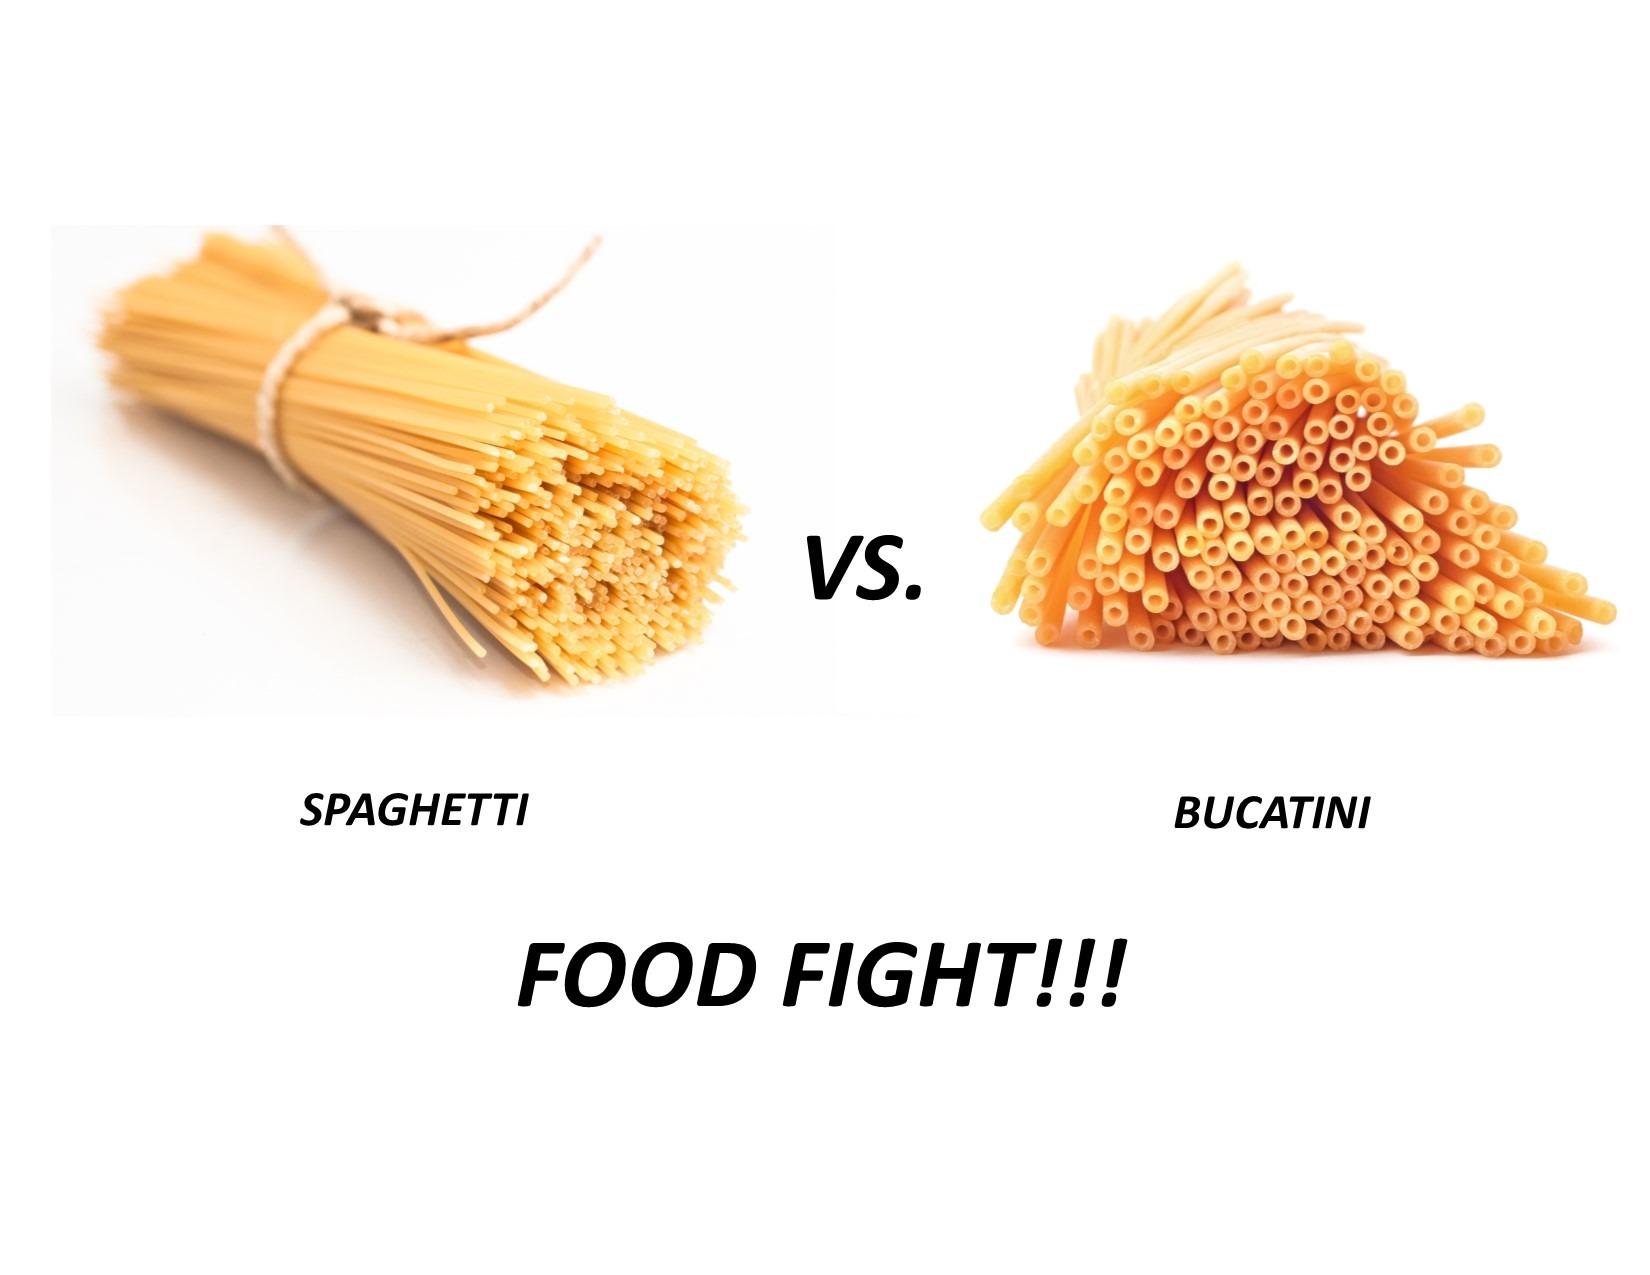 Spaghetti vs Bucatini